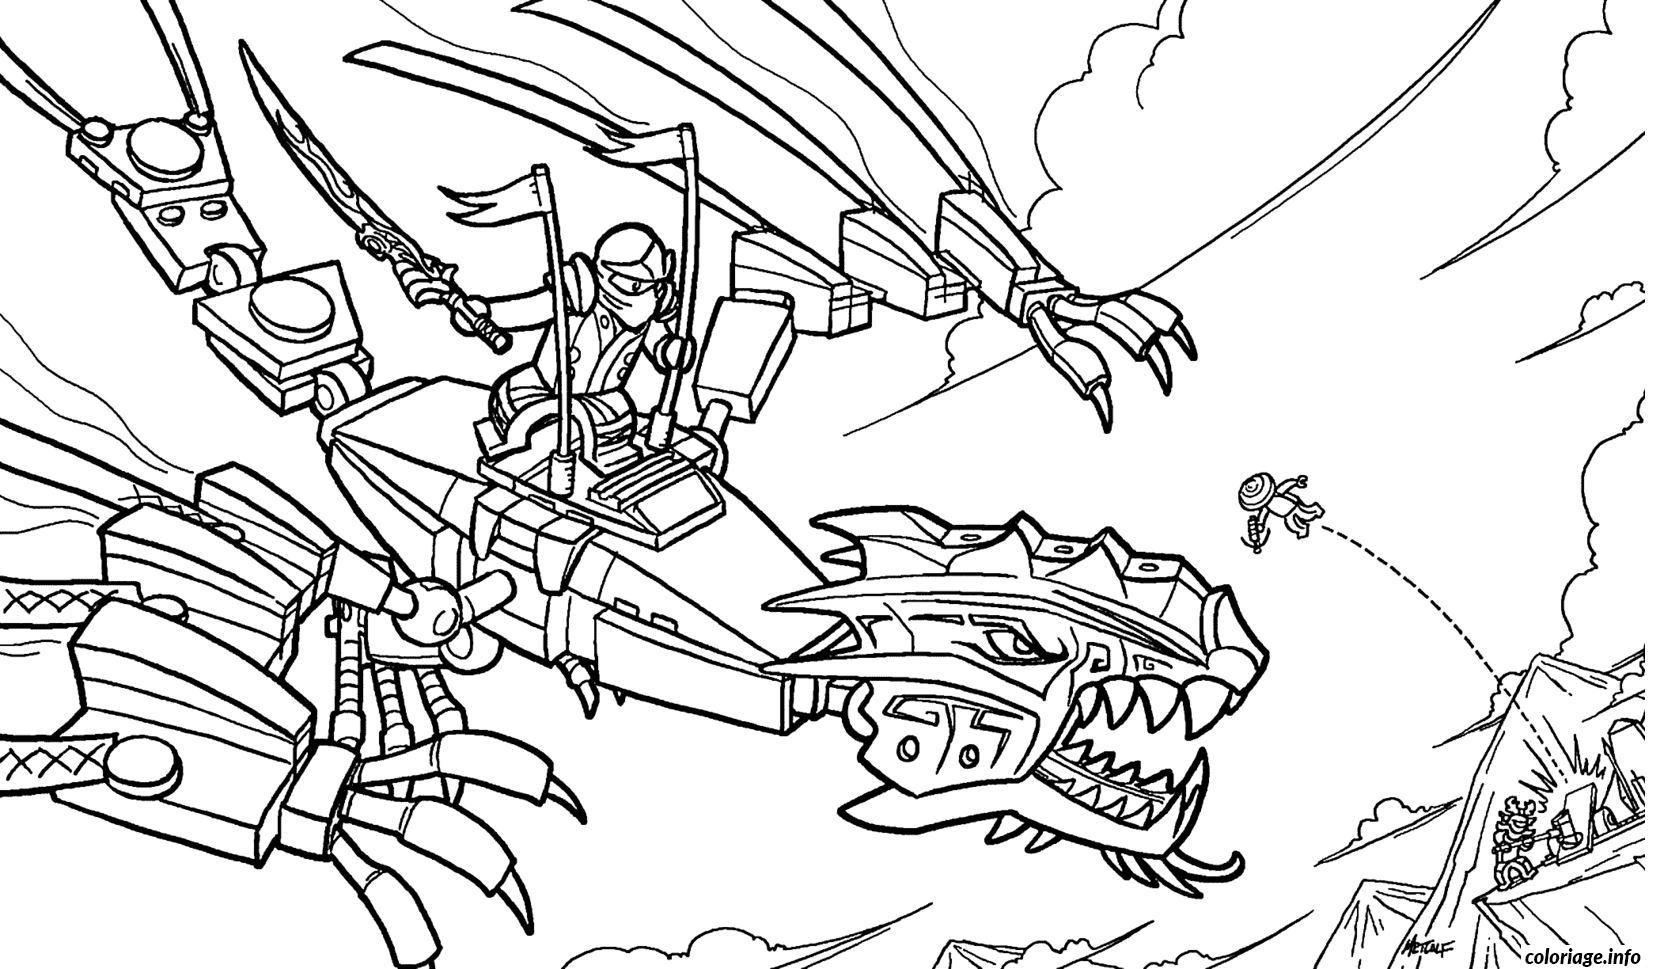 Ninjago Schlangen Ausmalbilder : Coloriage Ninjago Sur Un Dragon Ninja Dessin Imprimer Lego